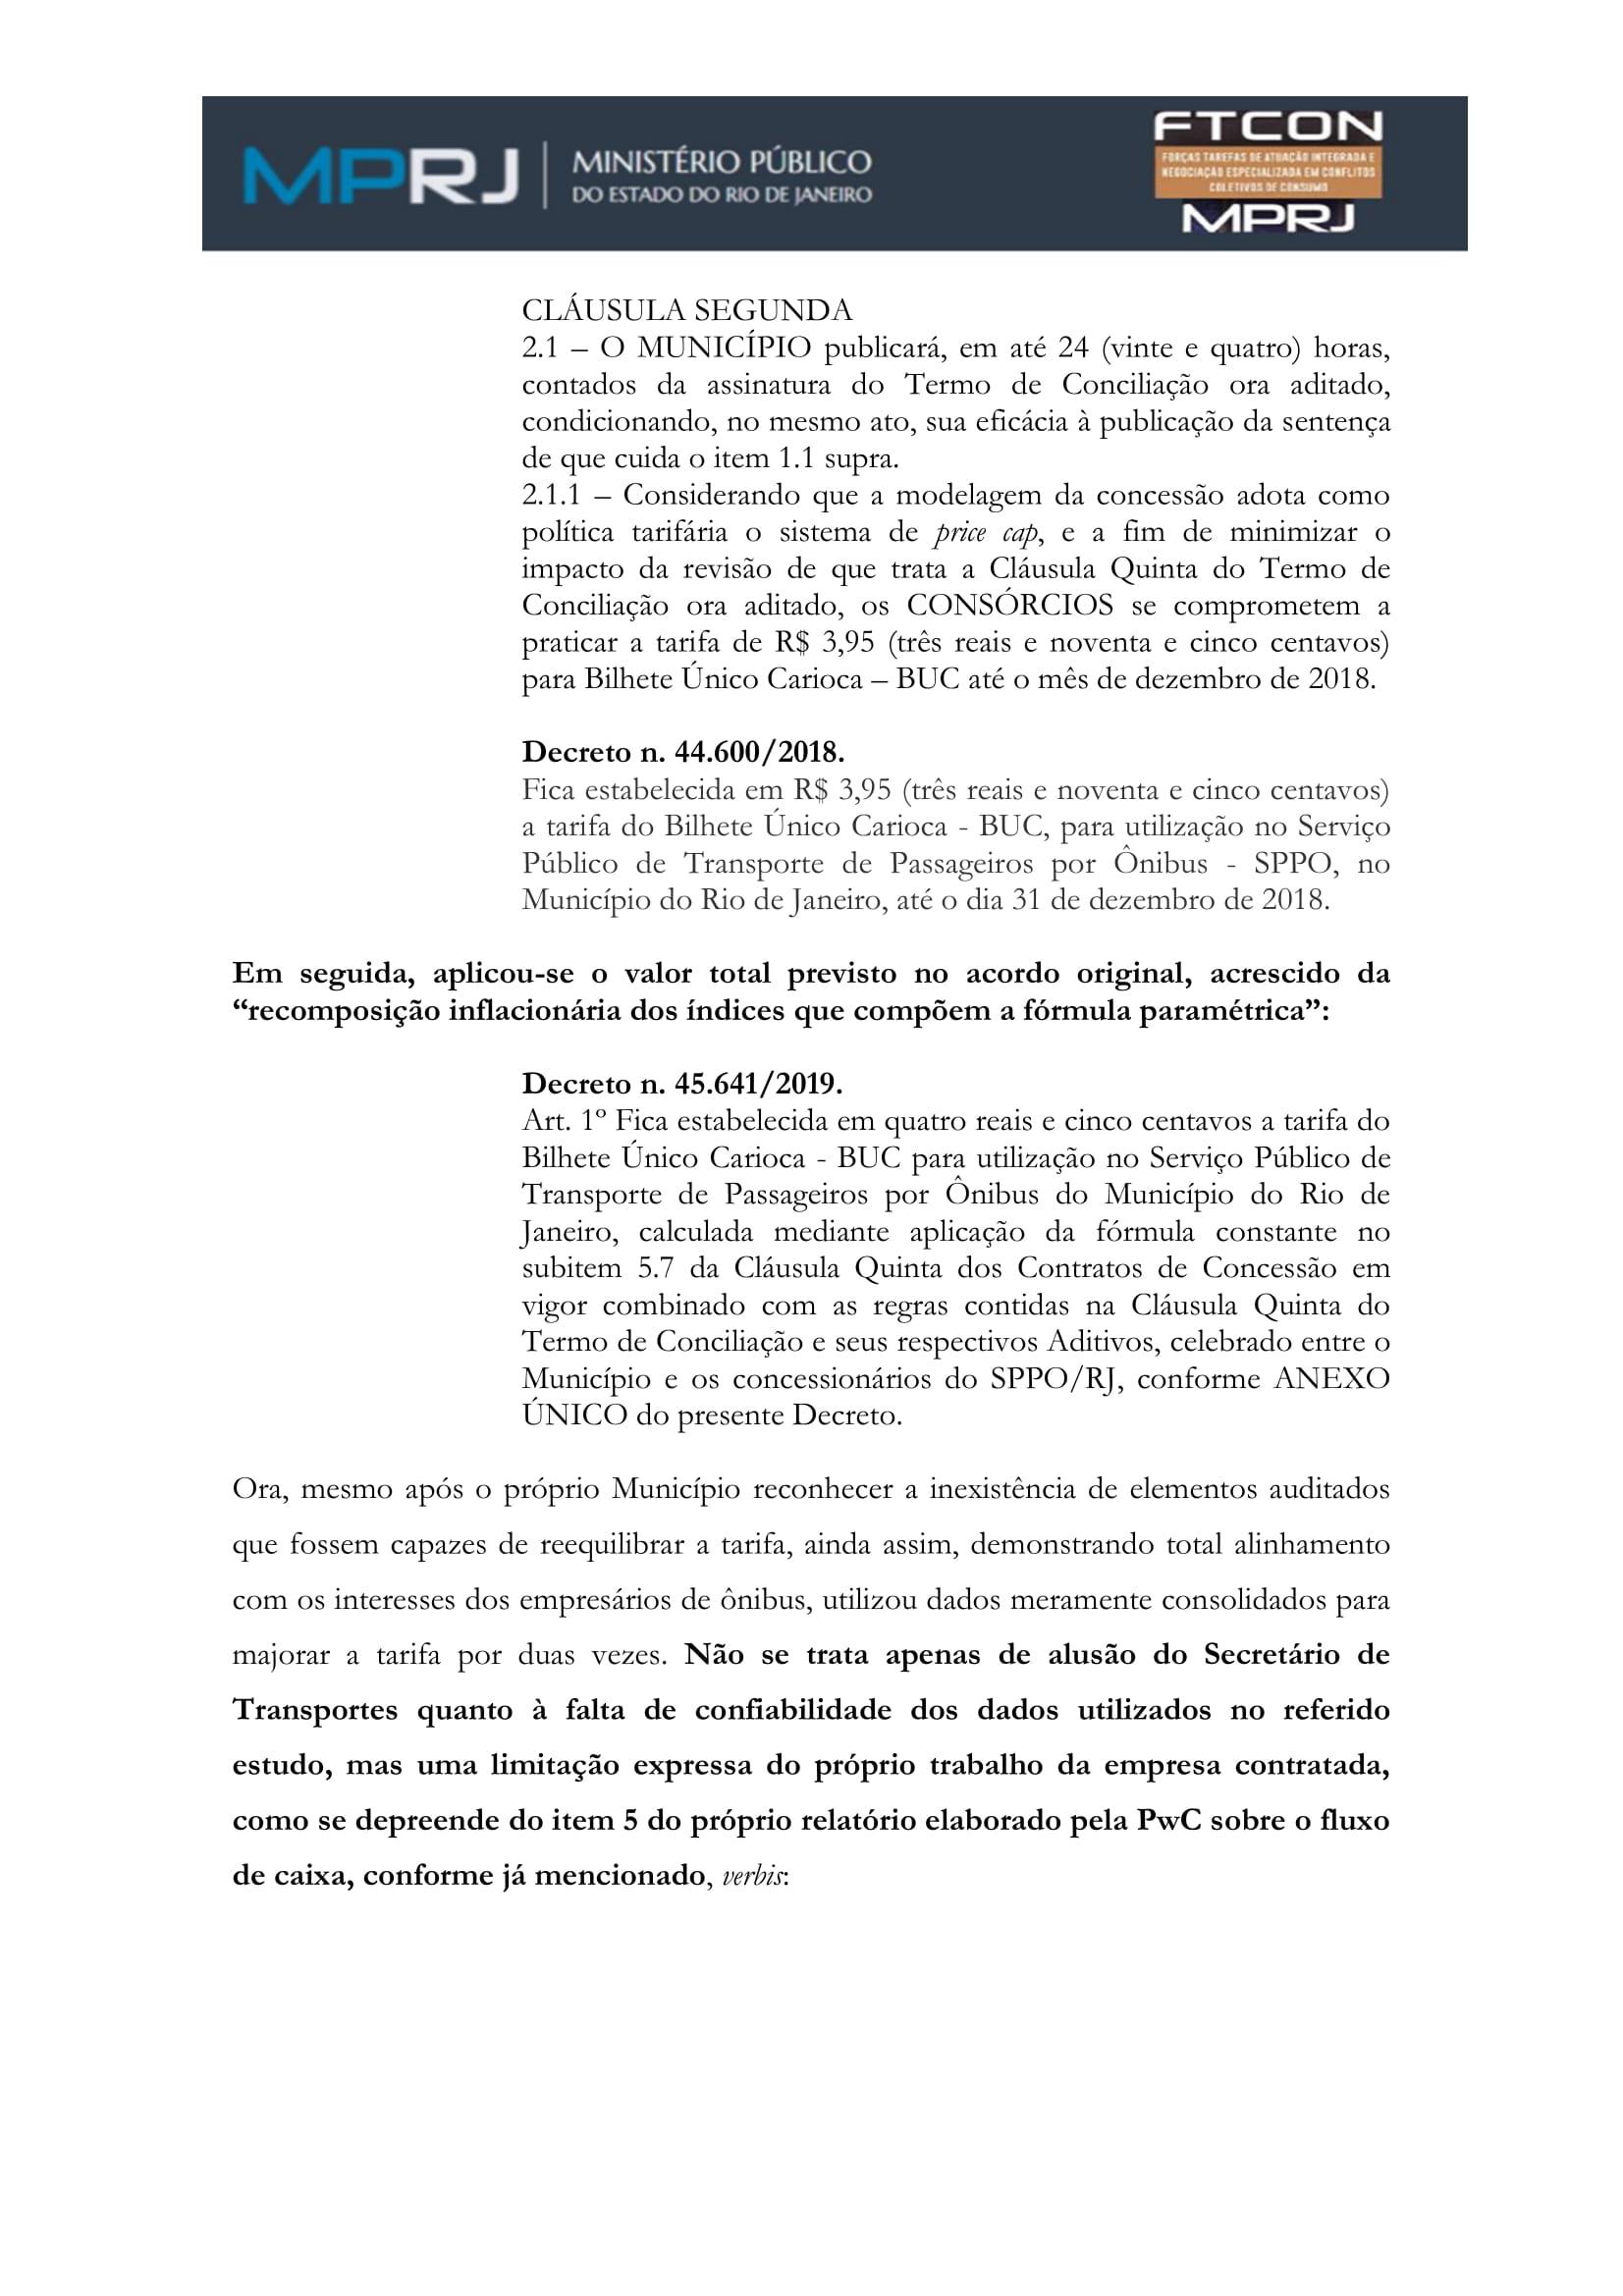 acp_caducidade_onibus_dr_rt-117